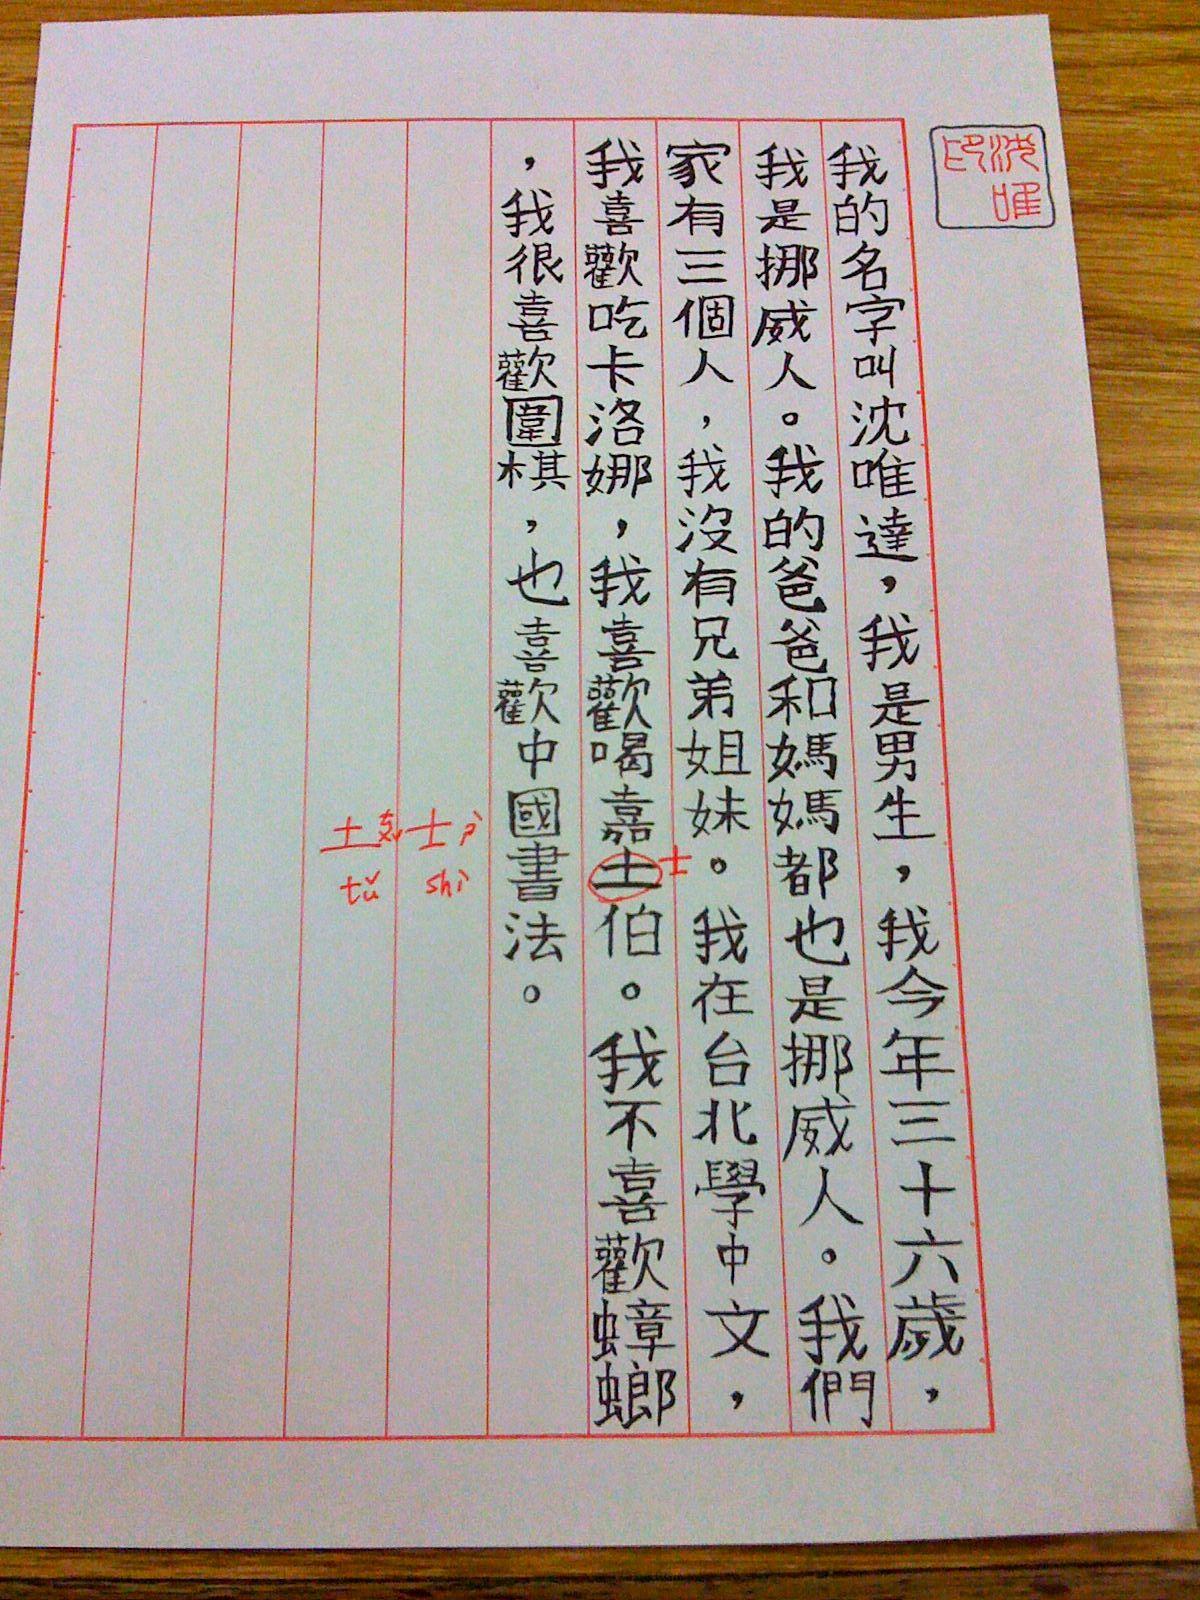 016 Essay Chinese Amazing Art Topics Vce Formats Sheet Full